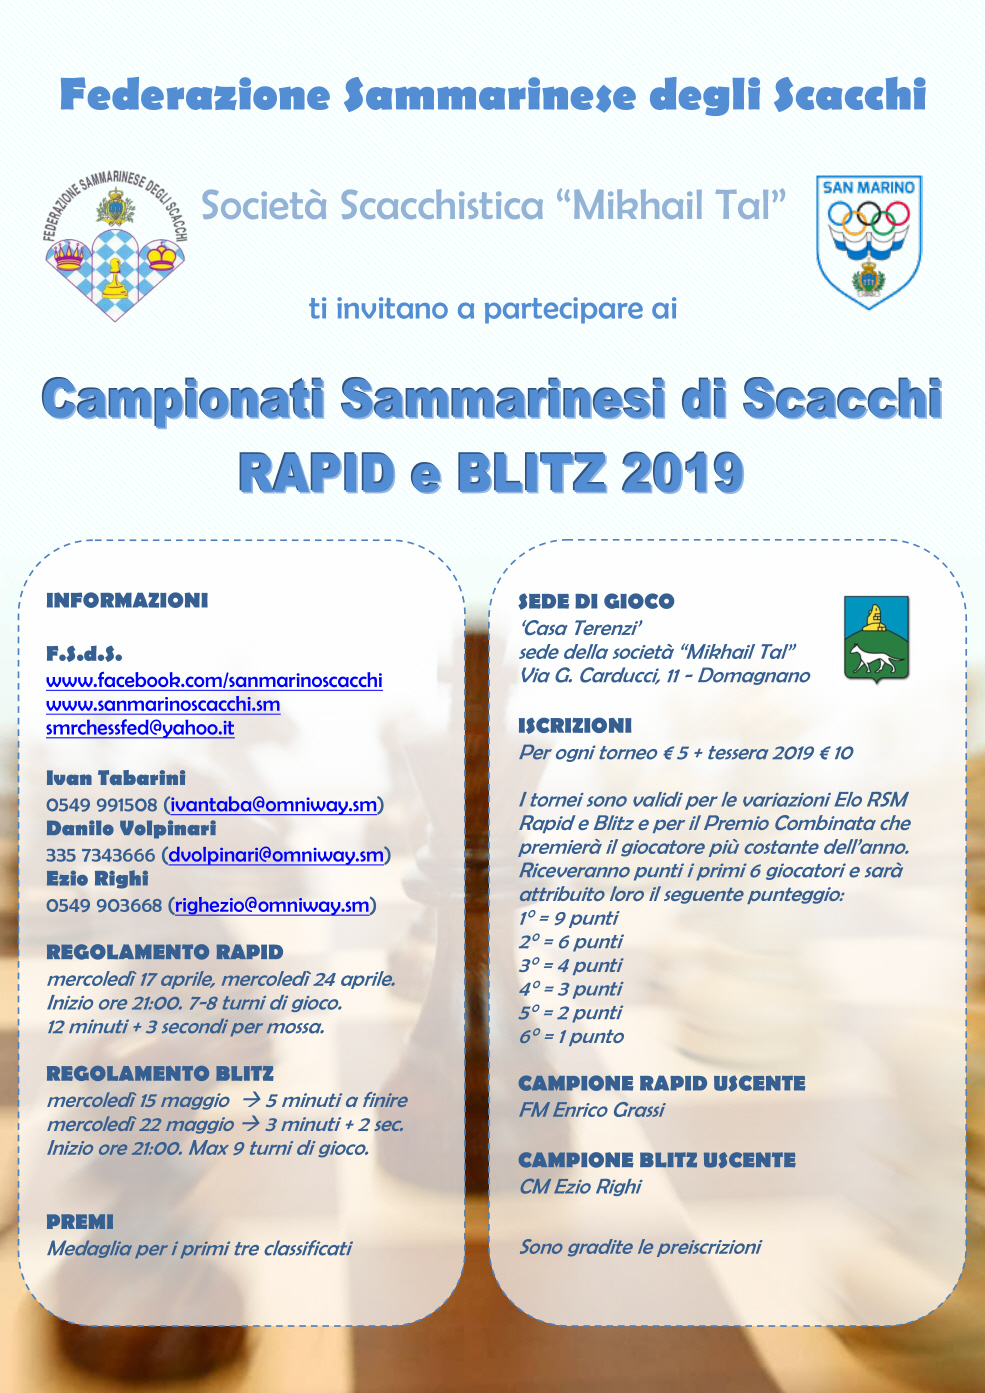 Campionati Sammarinesi Rapid e Blitz 2019